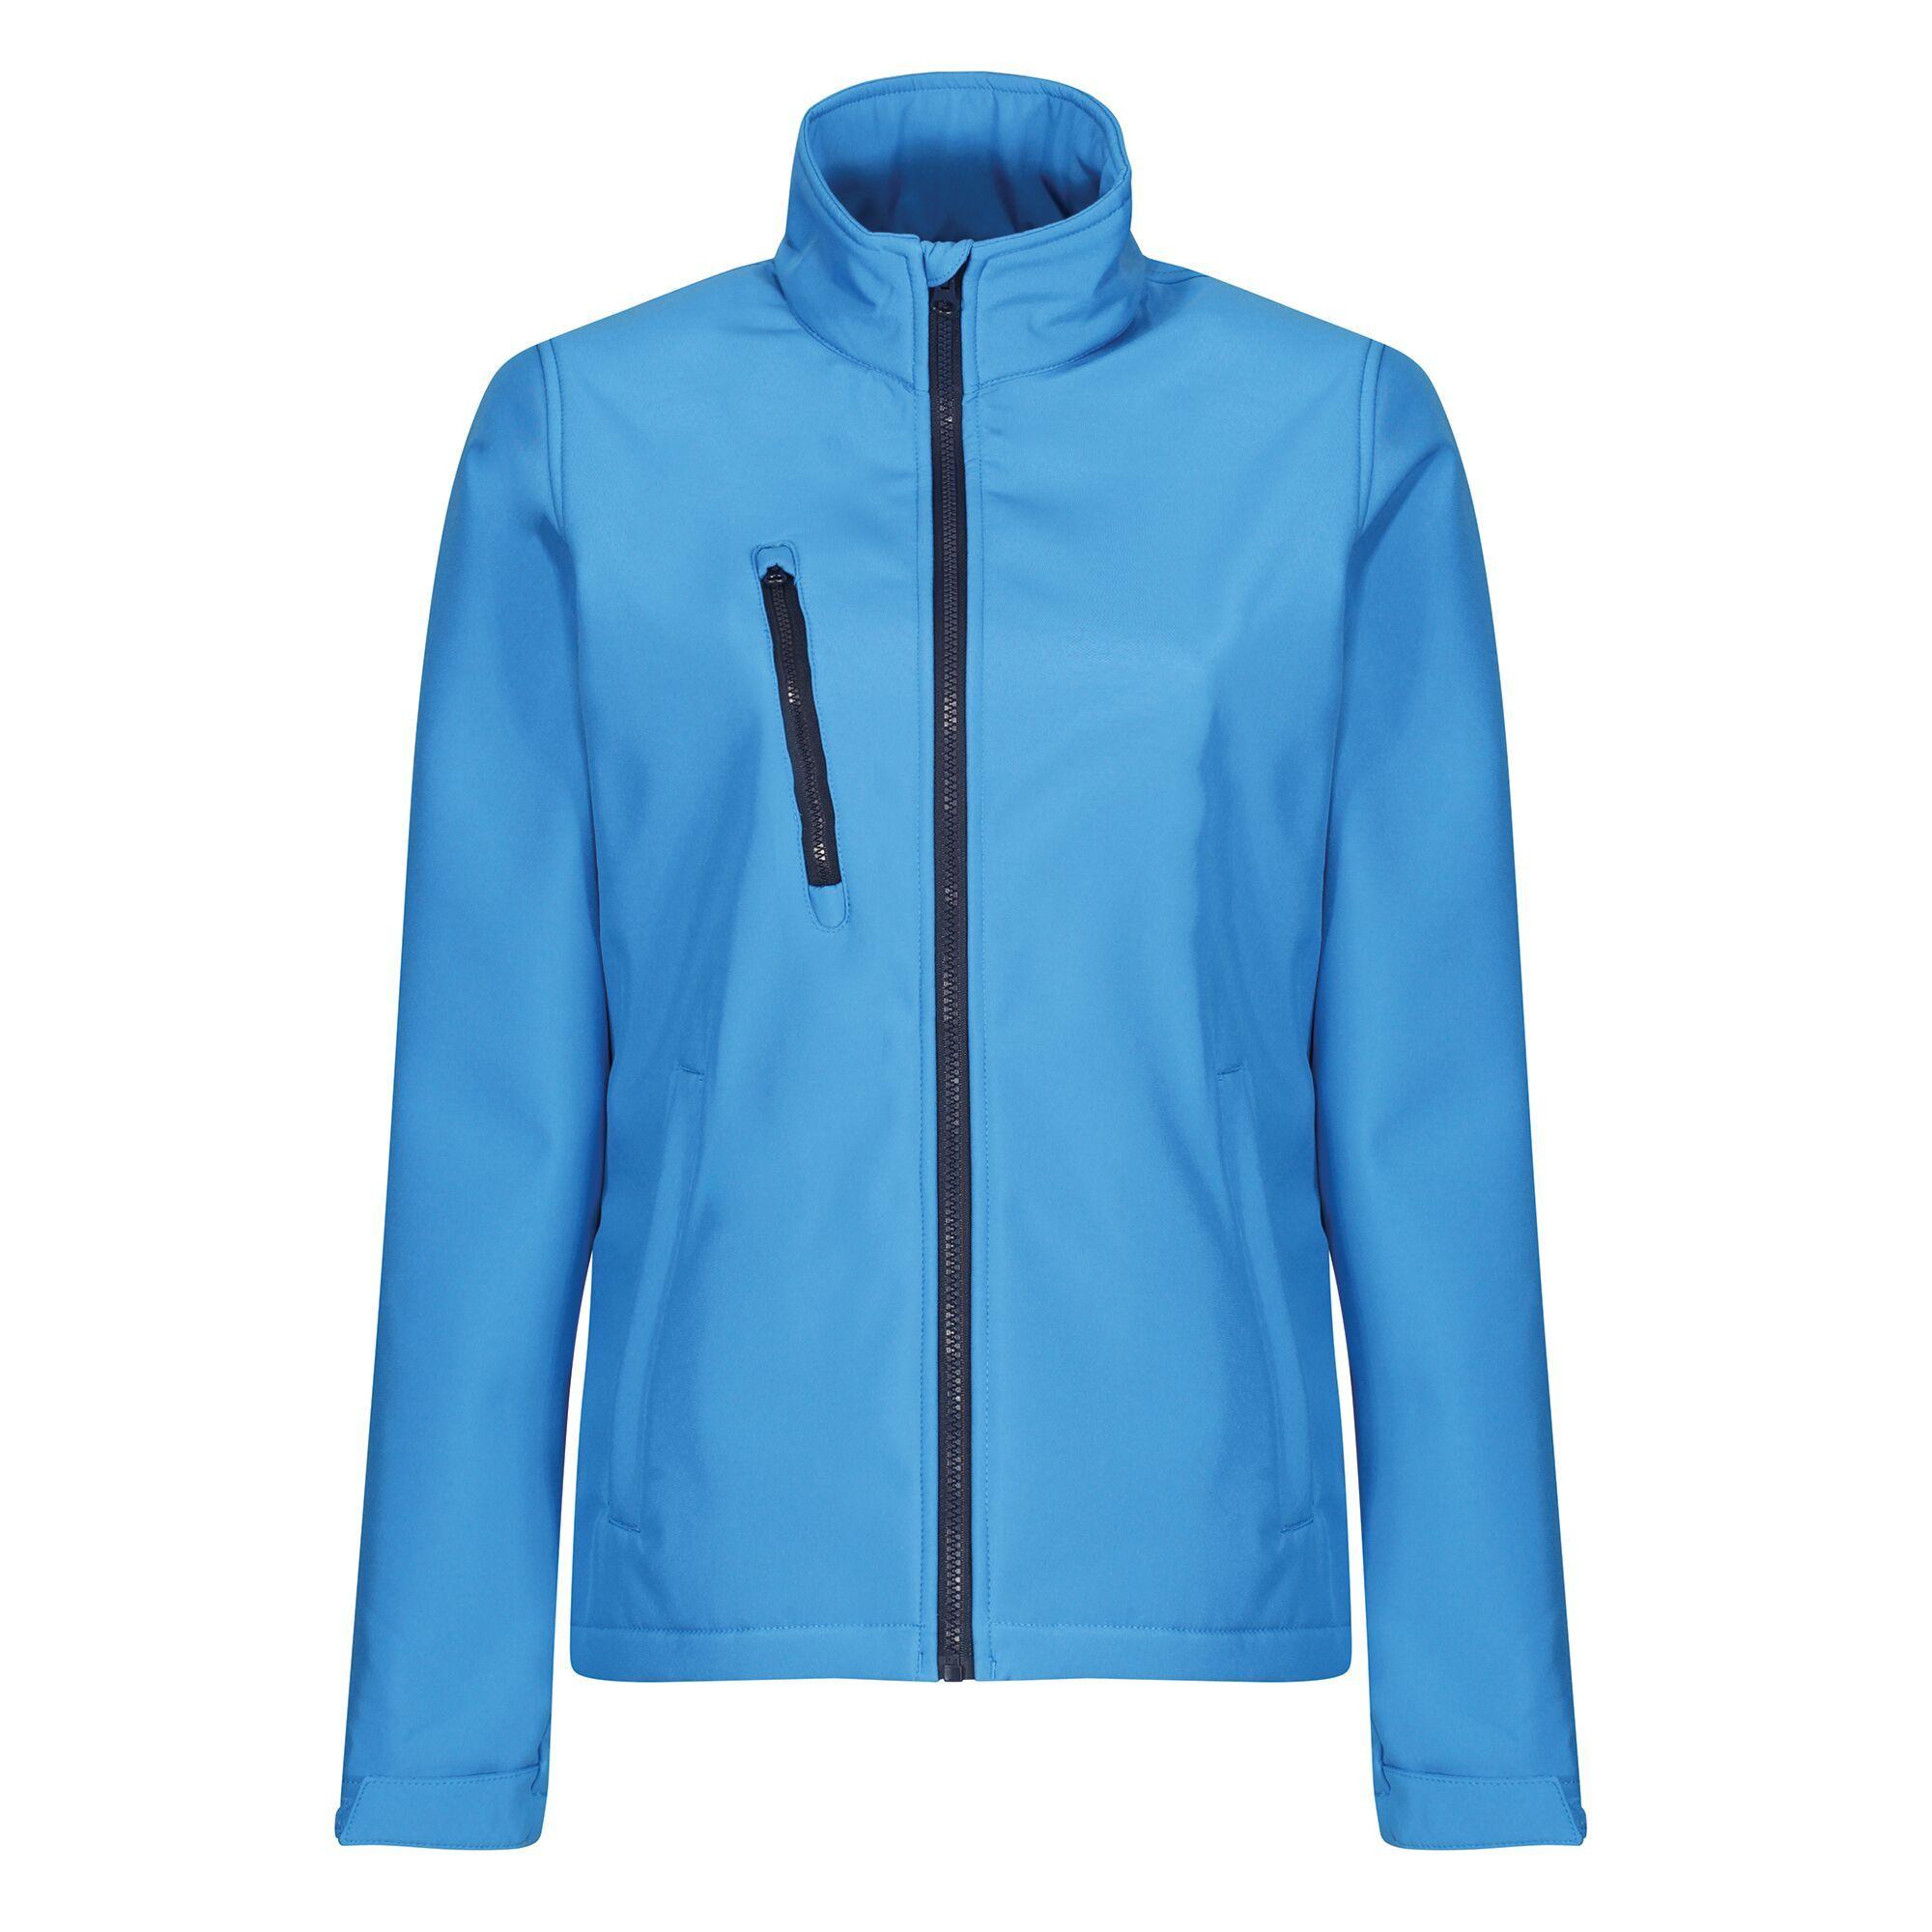 Regatta Womens/Ladies Ablaze 3 Layer Membrane Soft Shell Jacket (20 UK) (French Blue/Navy)